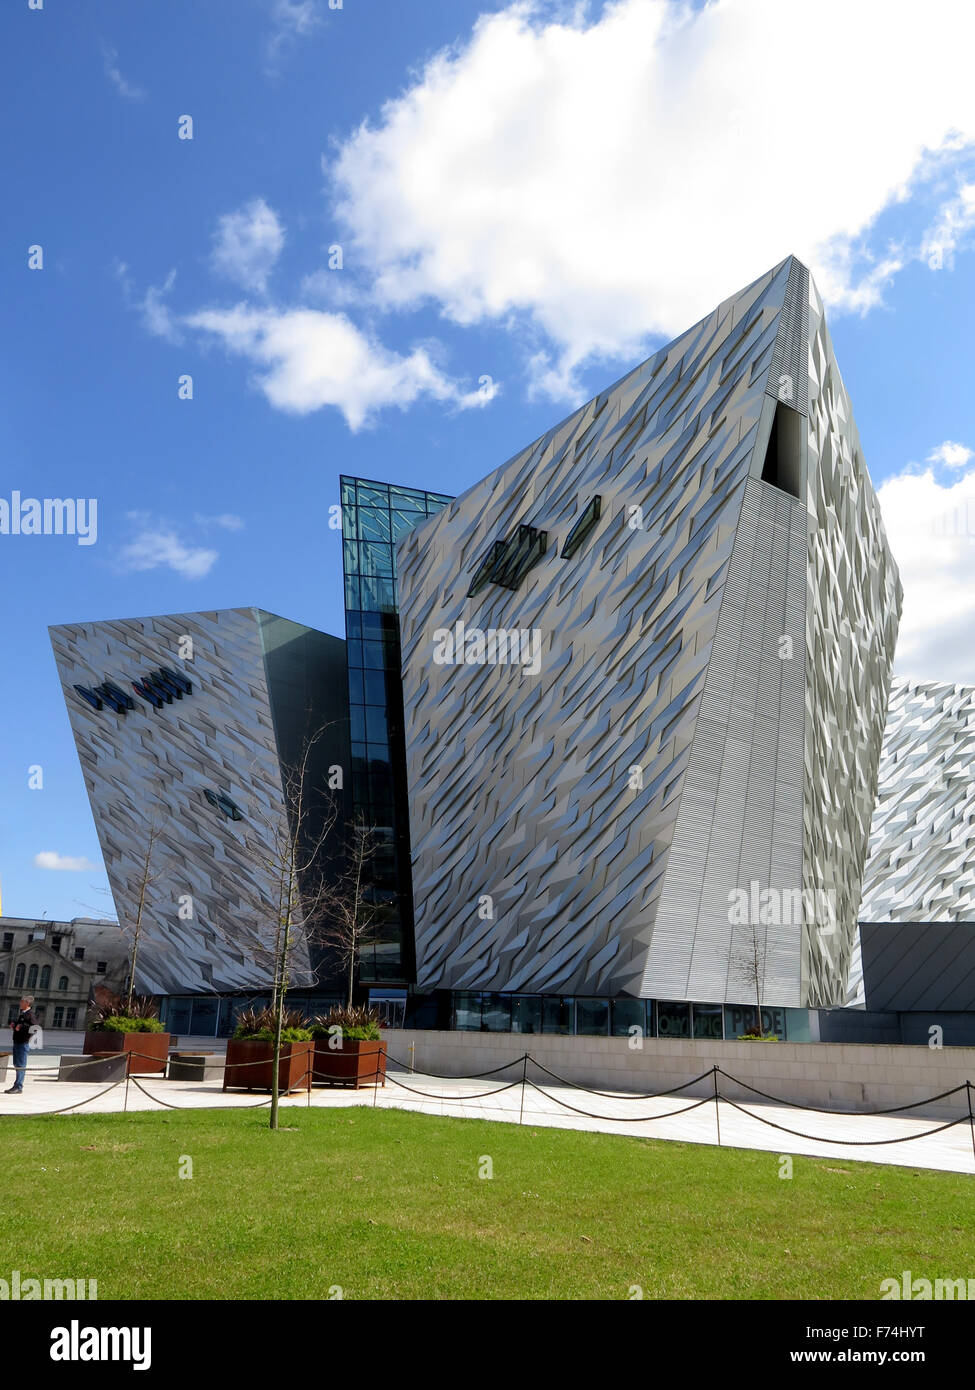 Exterior photograph of the Titanic Belfast exhibition halls - Stock Image